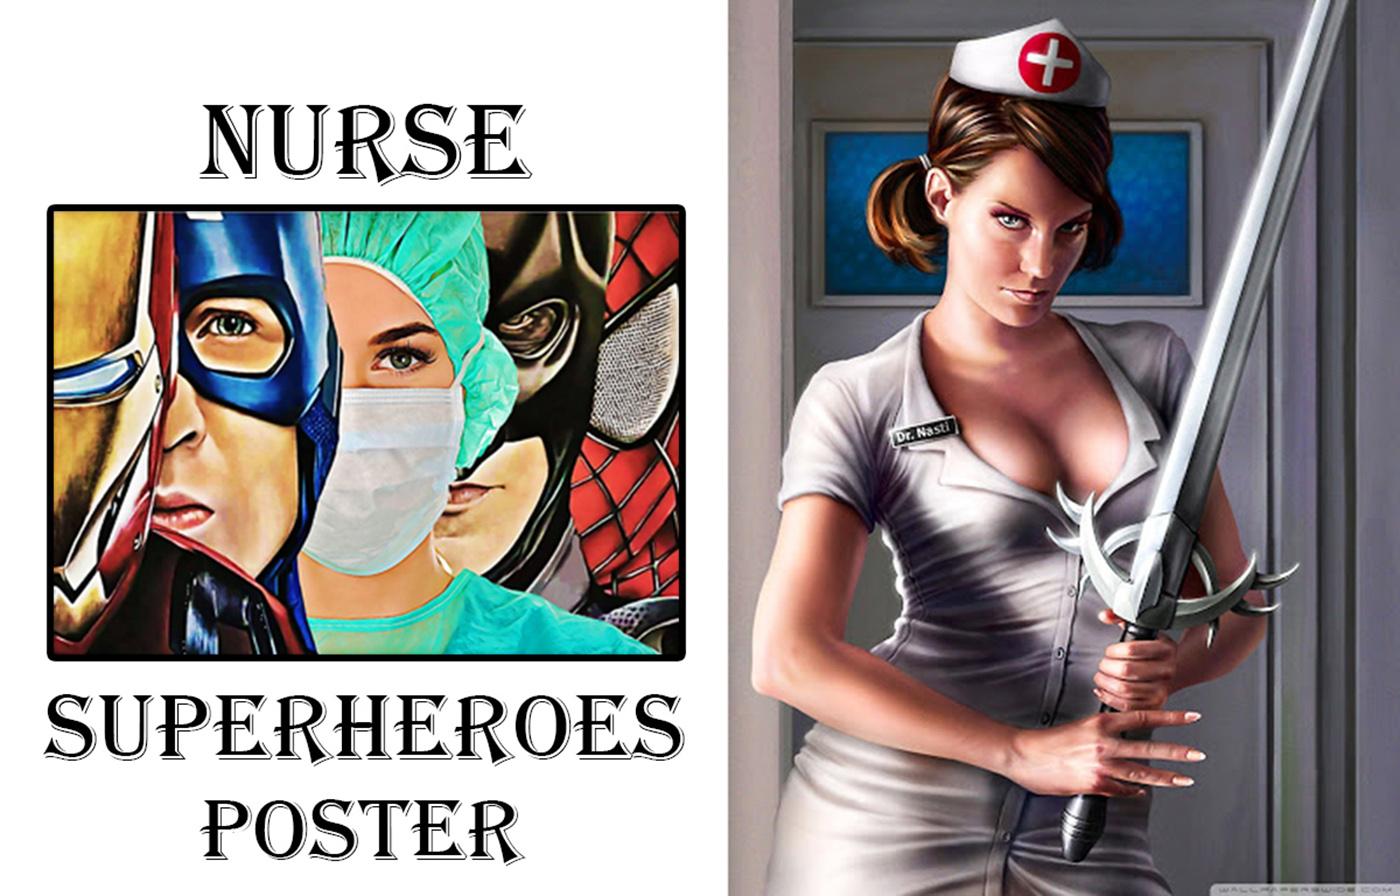 Nurse Super Heroes Iron Man Poster a2